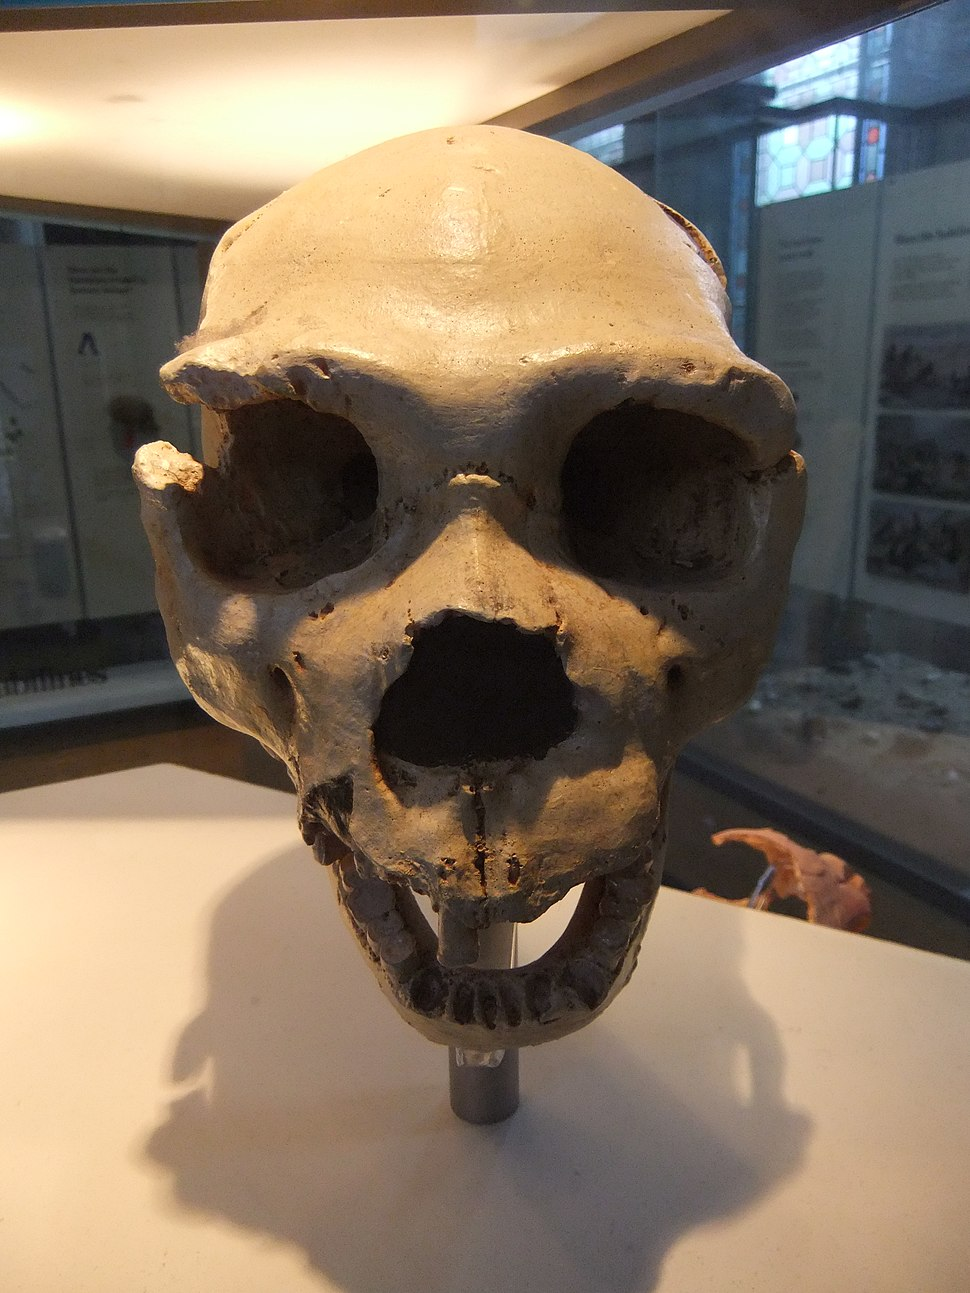 Skull, Natural History Museum, London - DSCF0431